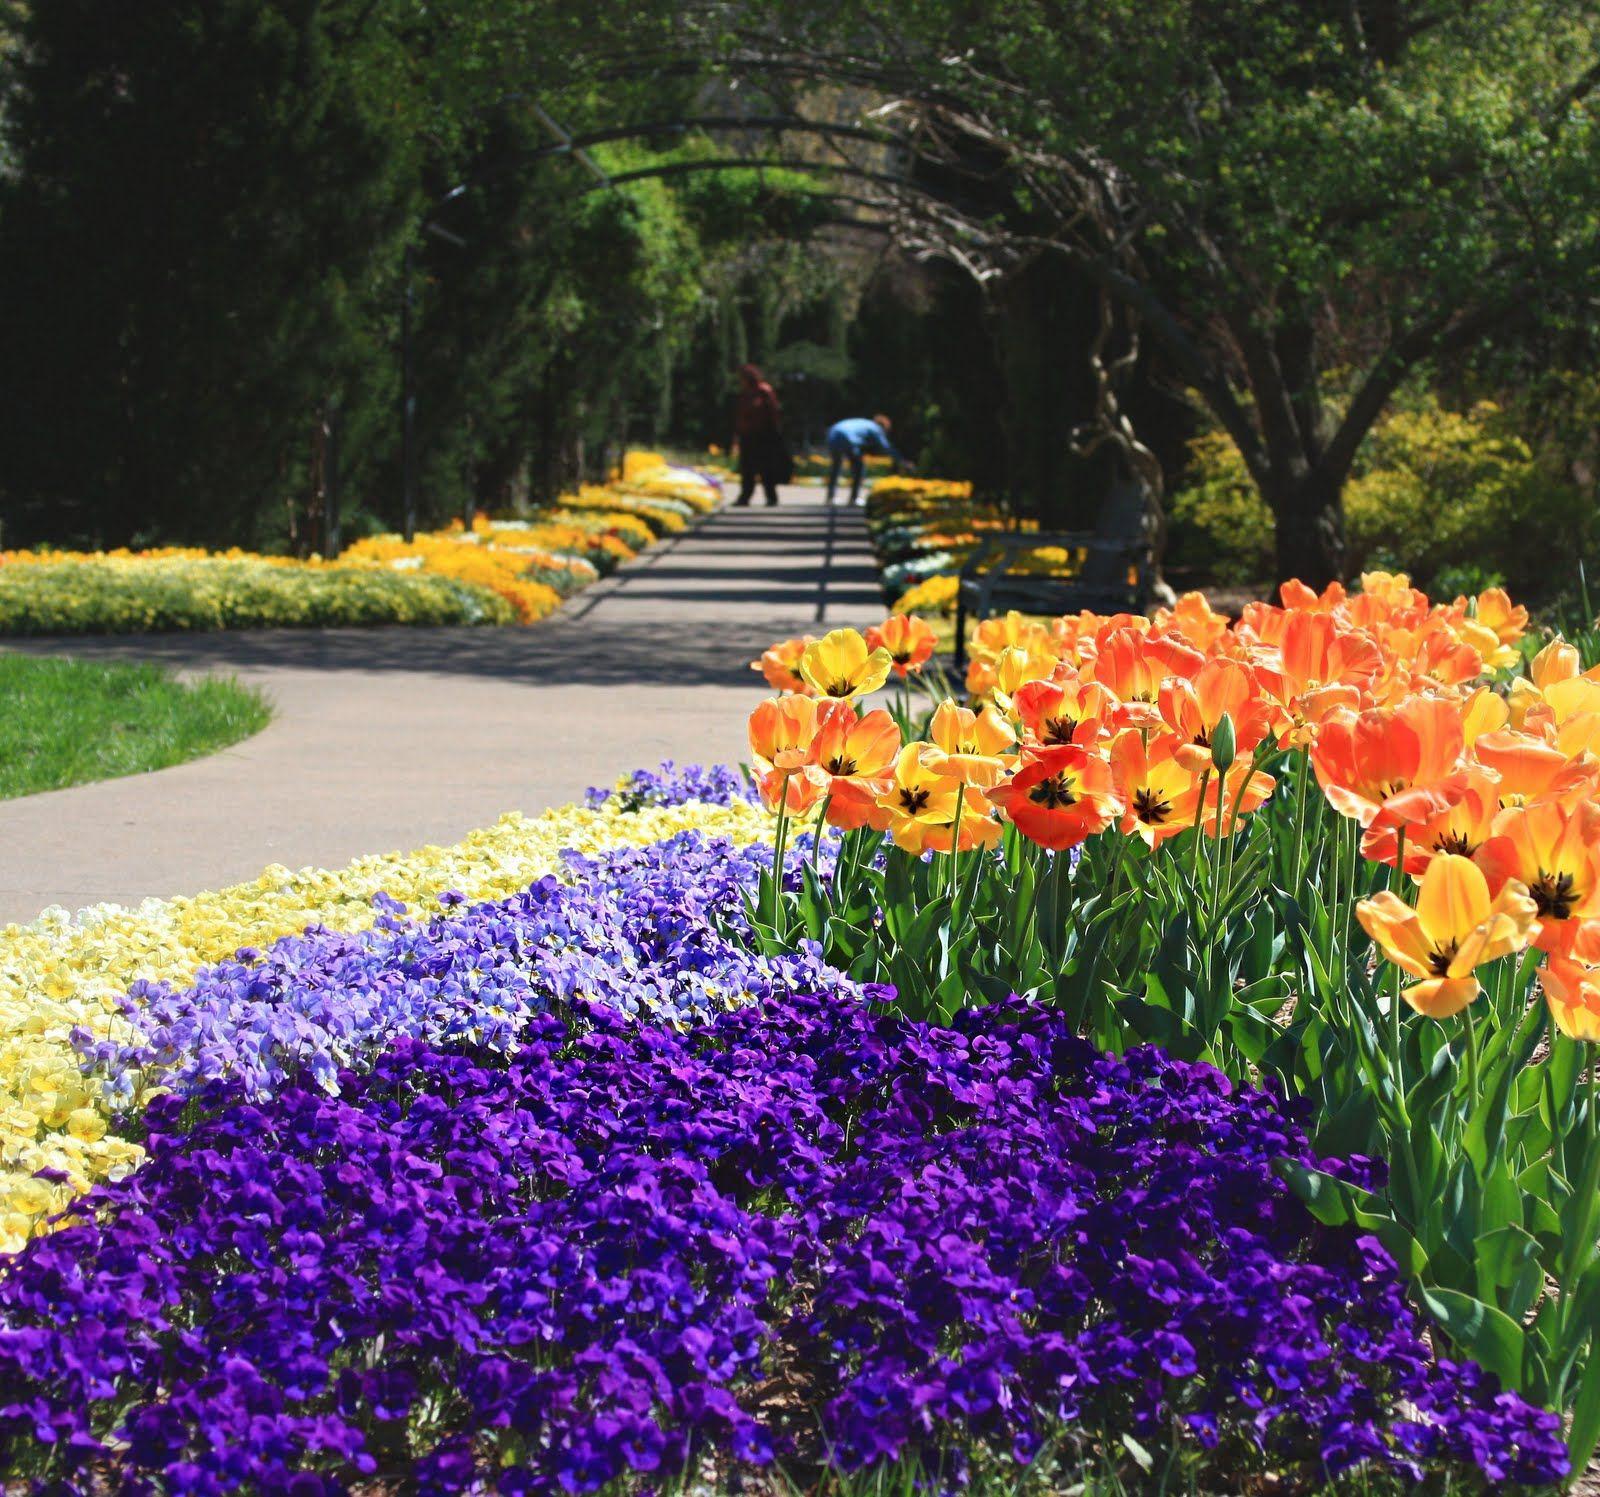 Delicieux Definitely Worth The Drive To Davidson County | Cheekwood Botanical Garden,  Nashville, TN |